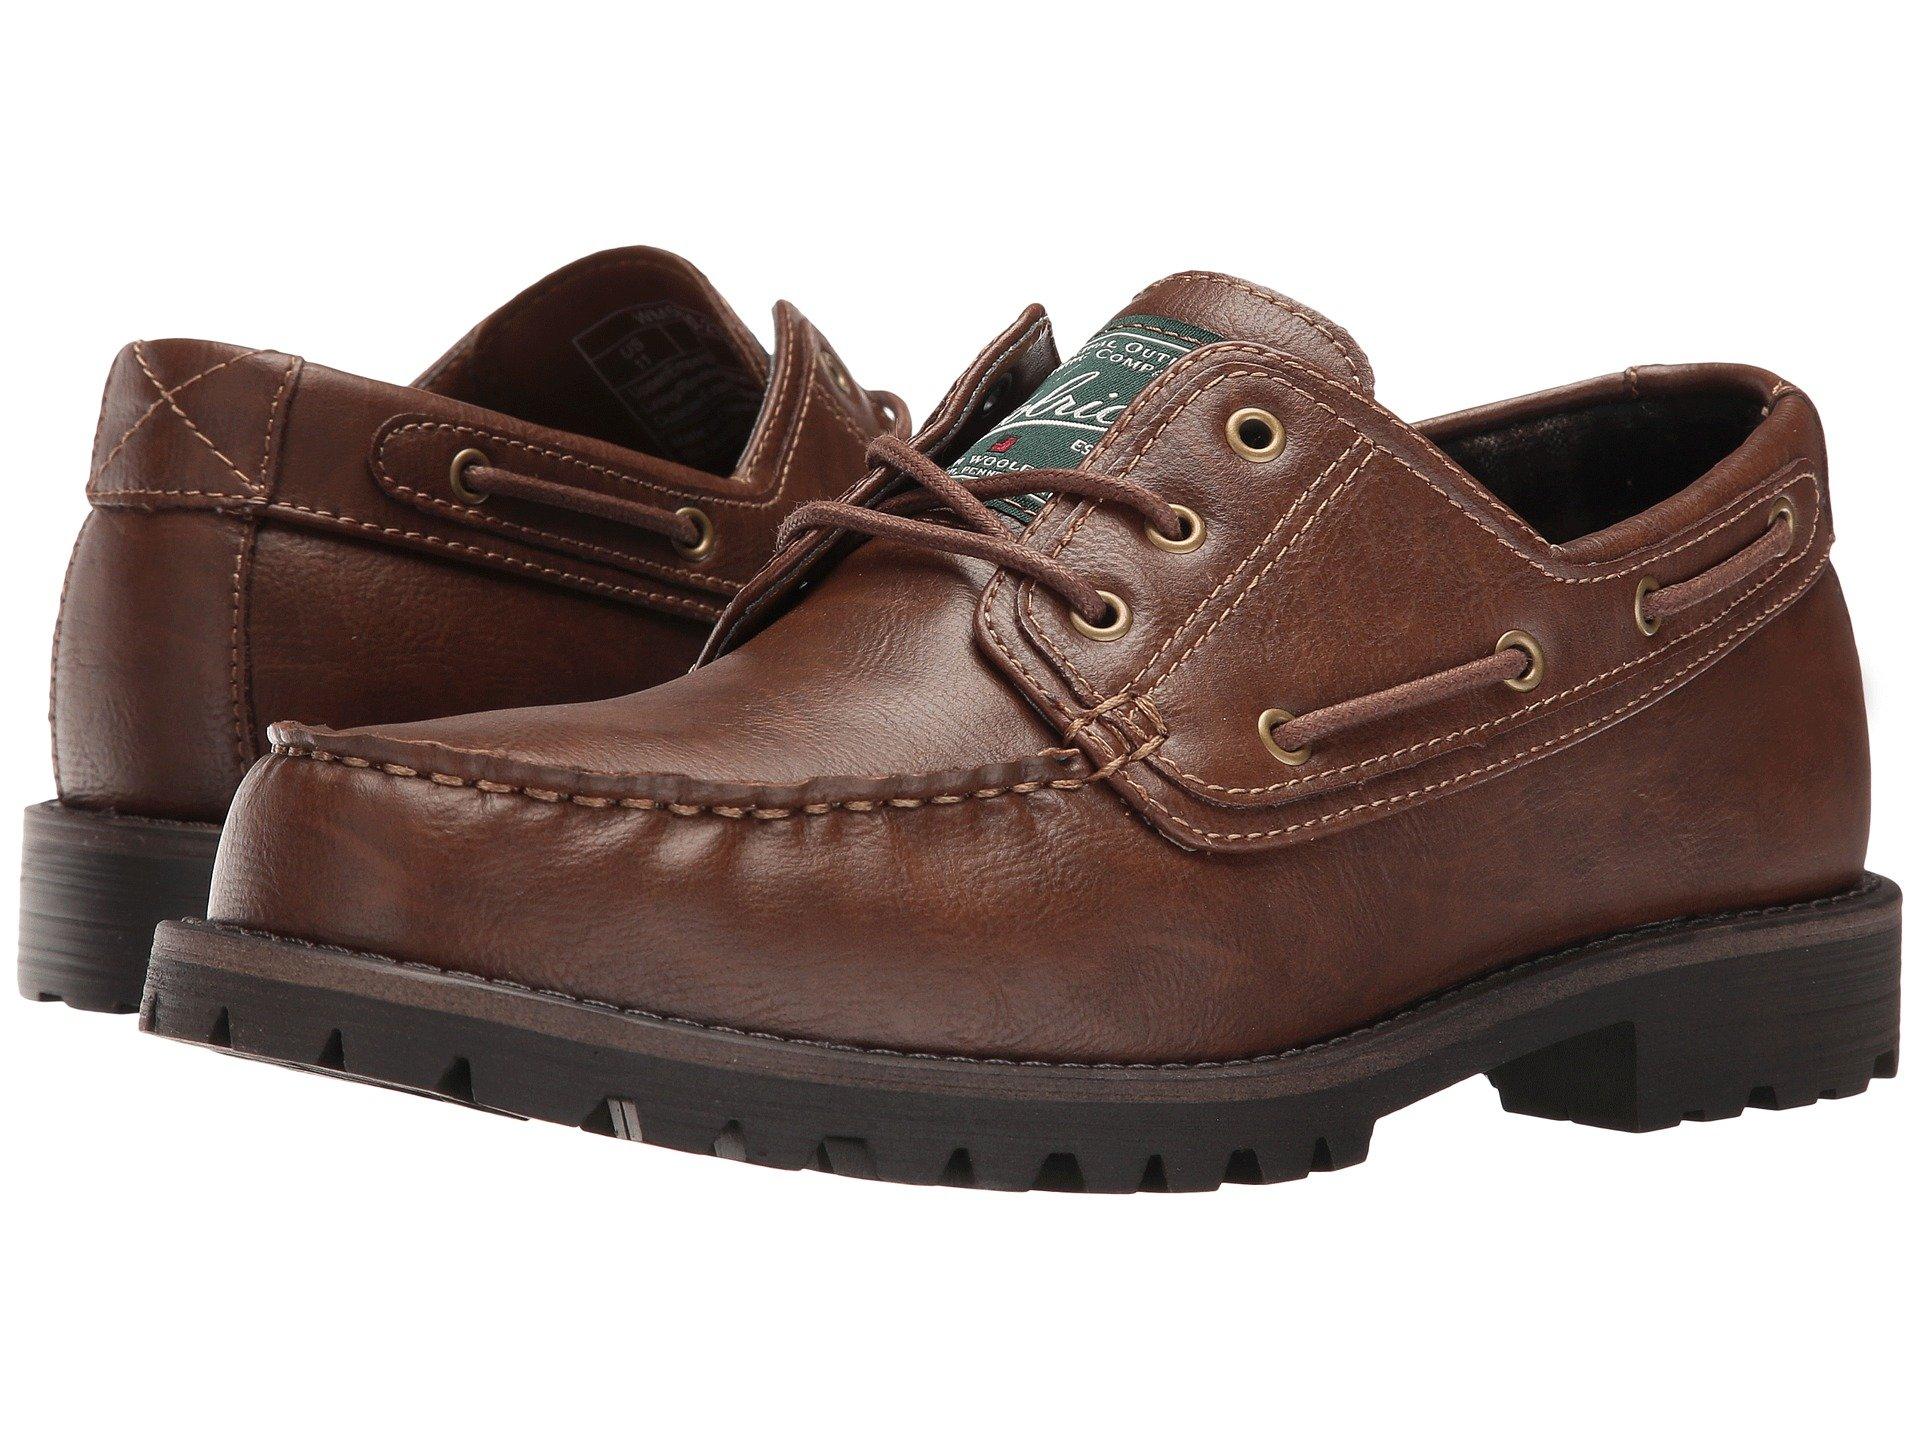 Calzado Tipo Boat Shoe para Hombre Woolrich Trout Run  + Woolrich en VeoyCompro.net